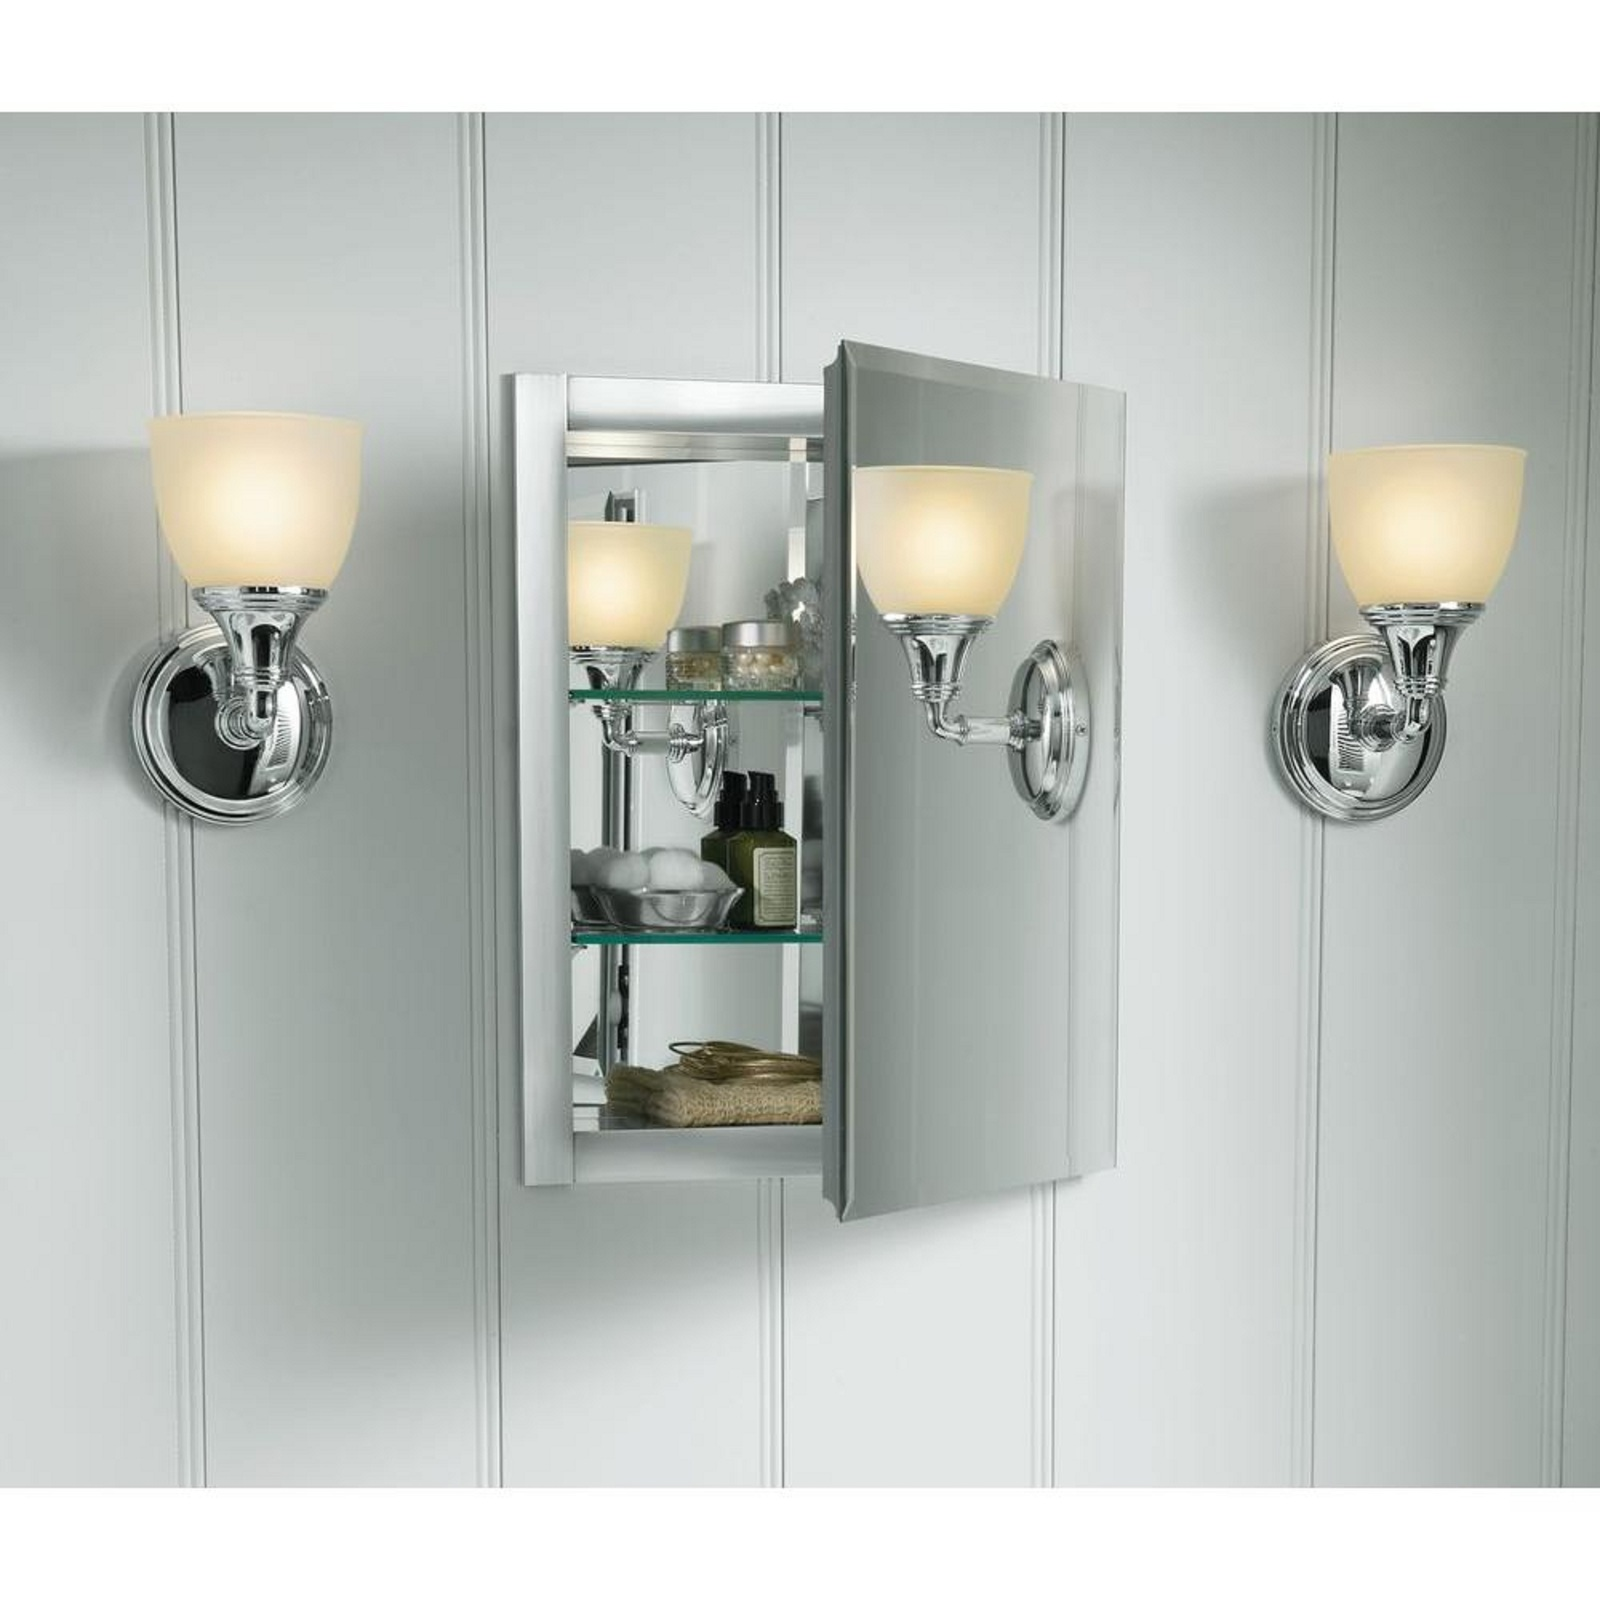 Kohler medicine cabinets k cb clr1620fs 40 1000